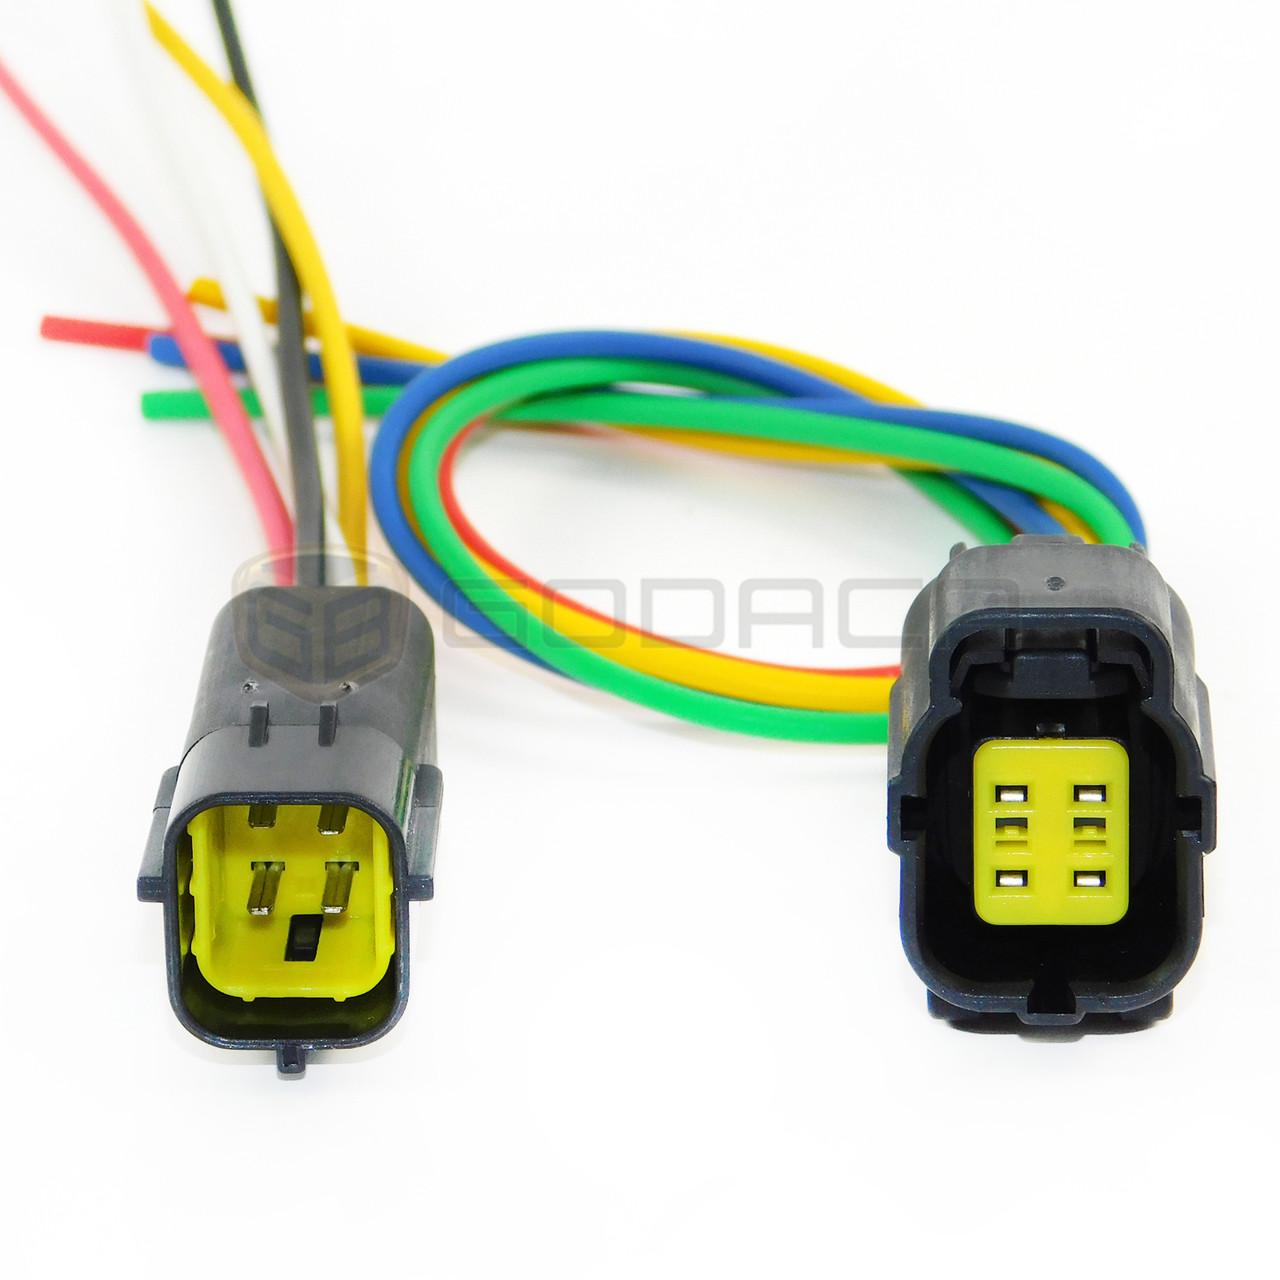 hight resolution of 1 x female male connector harness pigtail o2 oxygen sensor chevrolet ford honda godaca llc